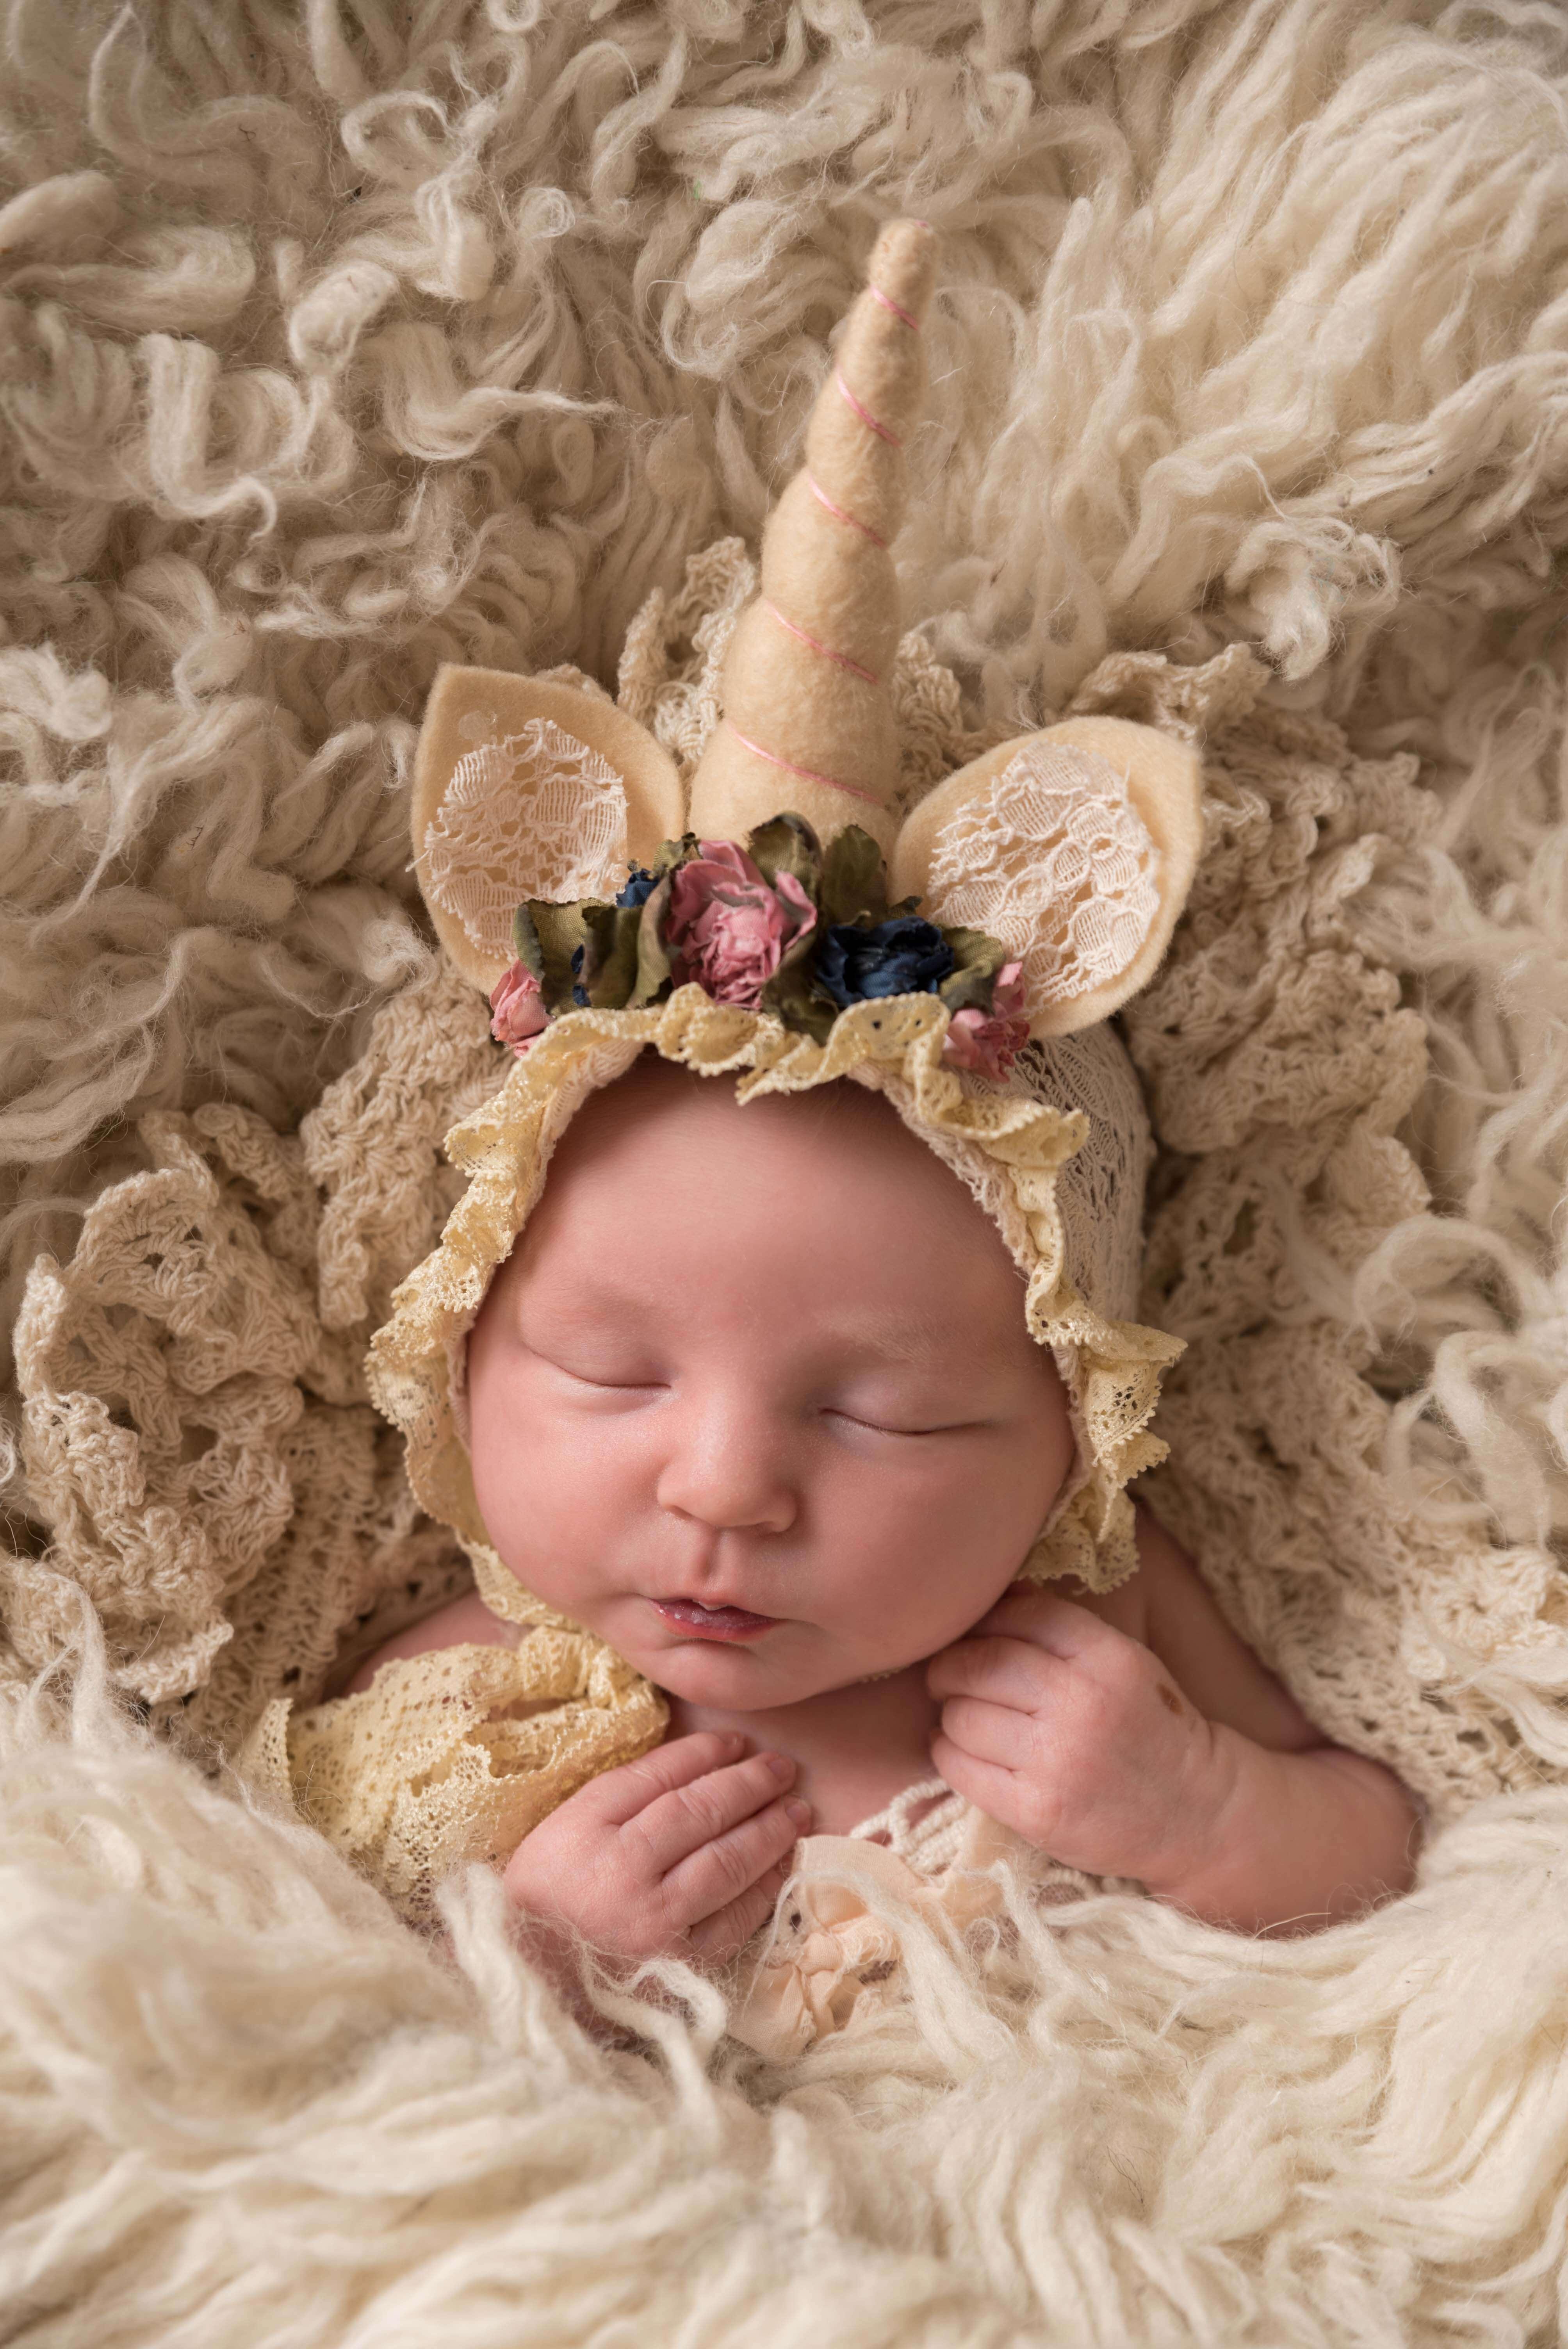 Fairies and Elves Photo Gallery Emilia (15 of 20)